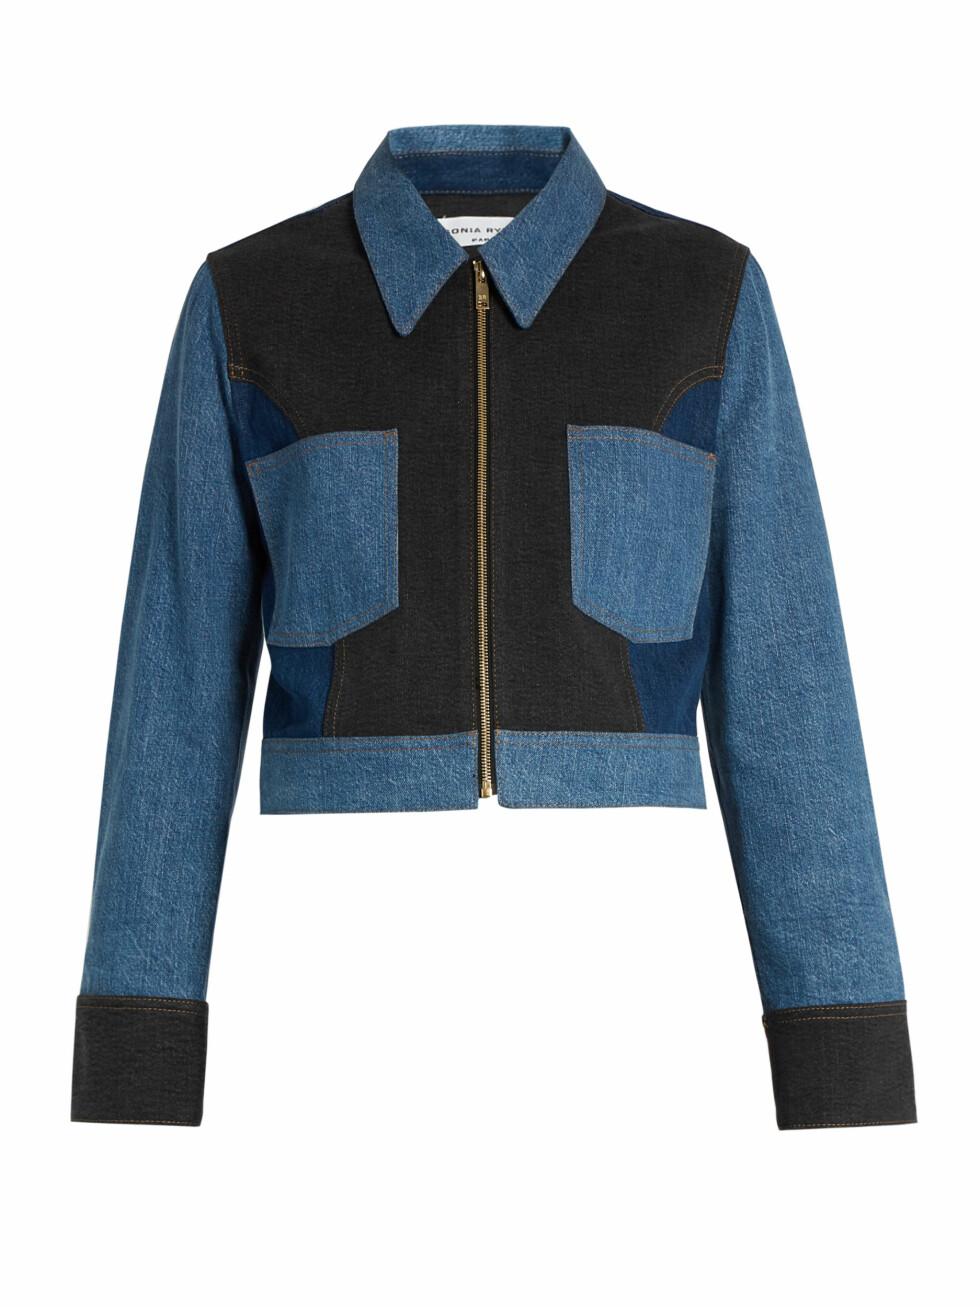 Jakke fra Sonia Rykiel via Matchesfashion.com | kr 2365 | http://www.matchesfashion.com/intl/products/Sonia-Rykiel-Point-collar-patchwork-cotton-blend-denim-jacket-1066826